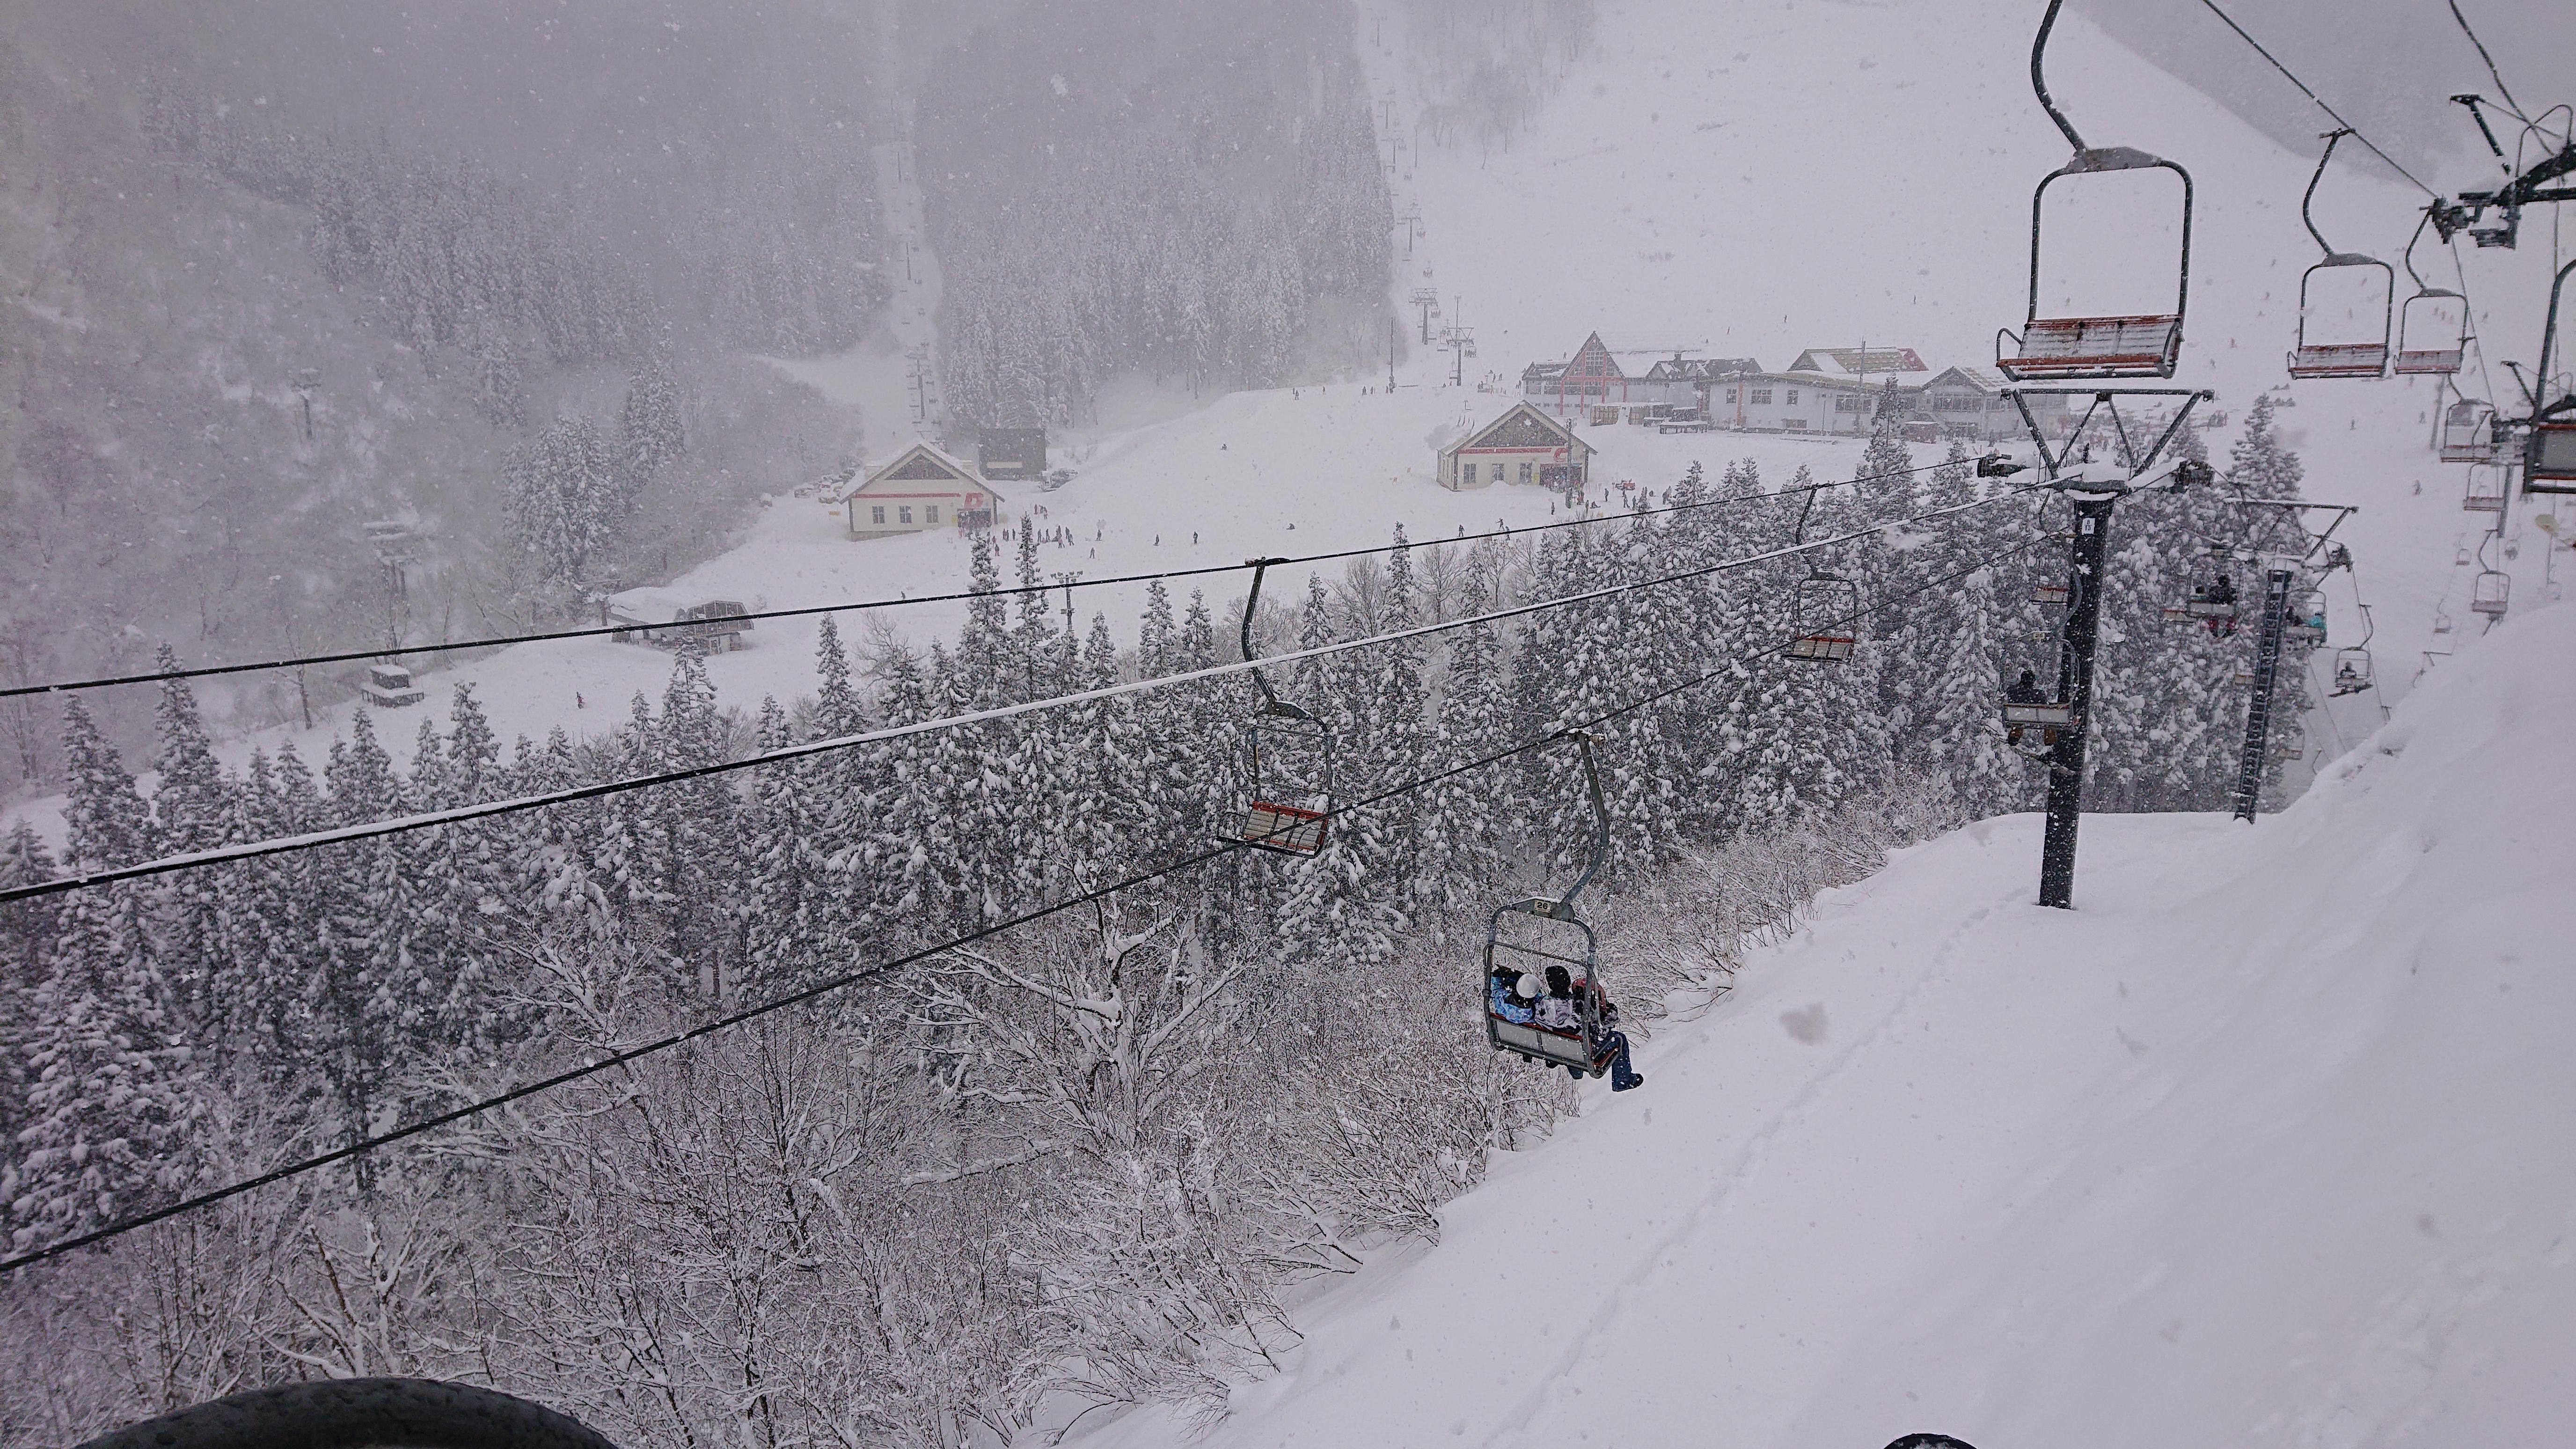 Kandatsu Snow Resort in Niigata